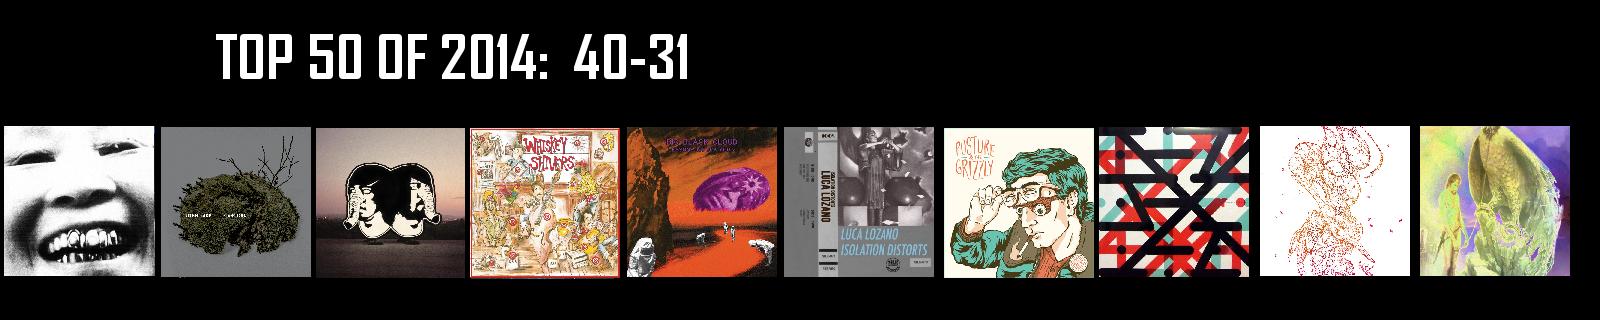 Best 2014 albums